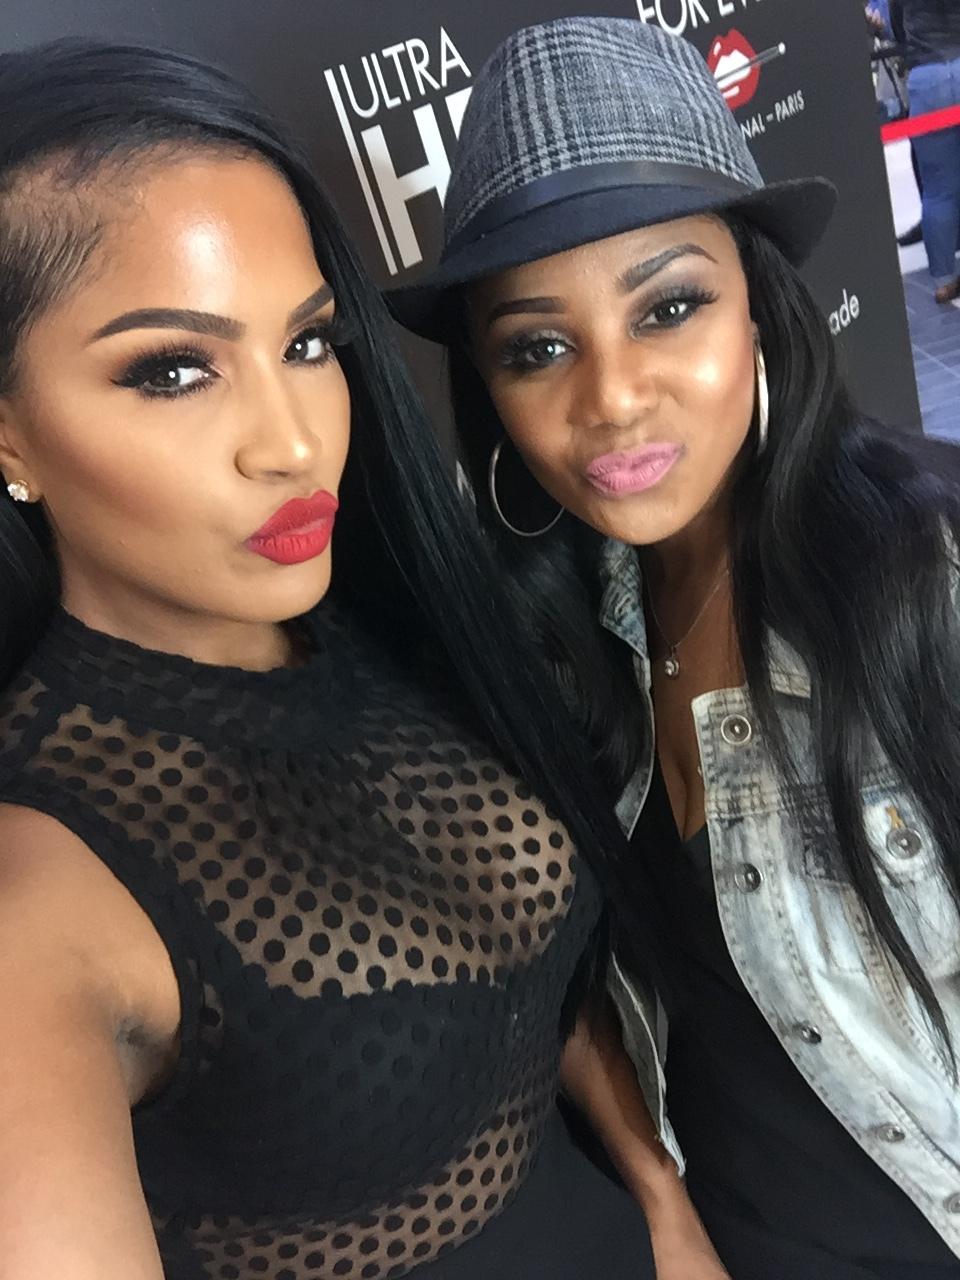 JayChantelle and MakeupShayla